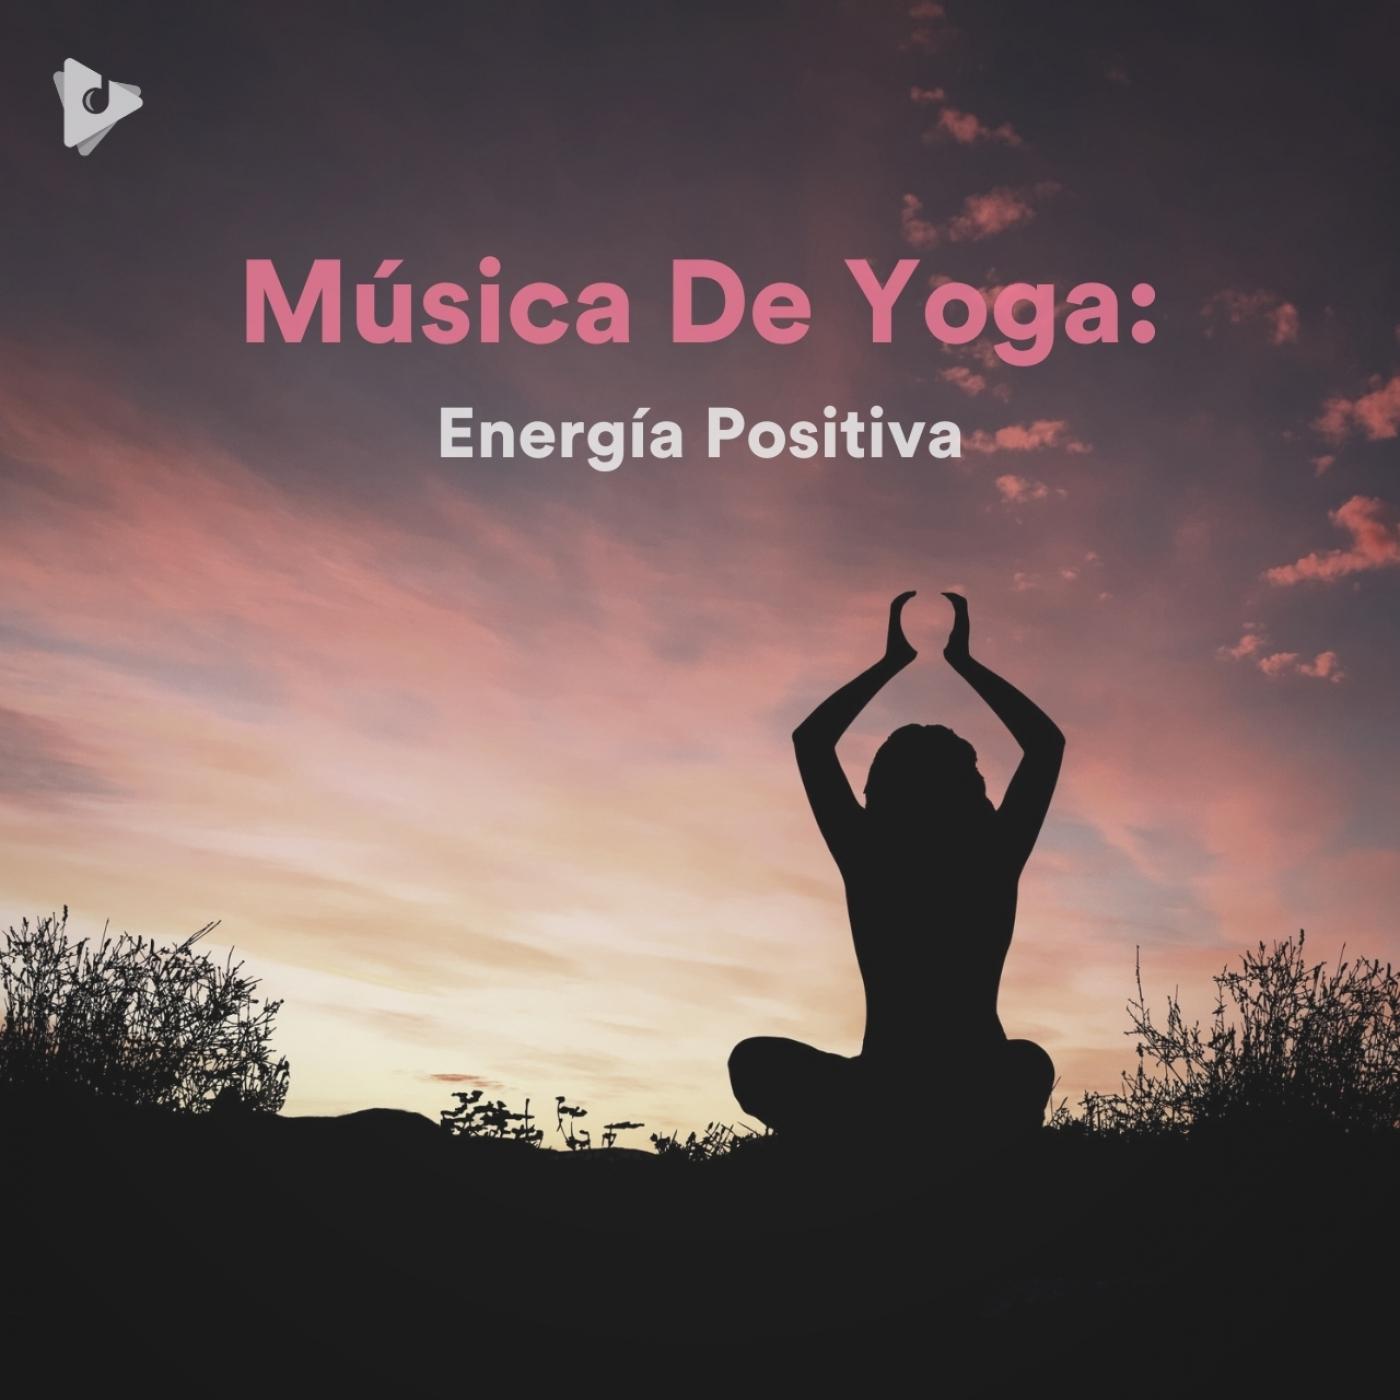 Música De Yoga: Energía Positiva